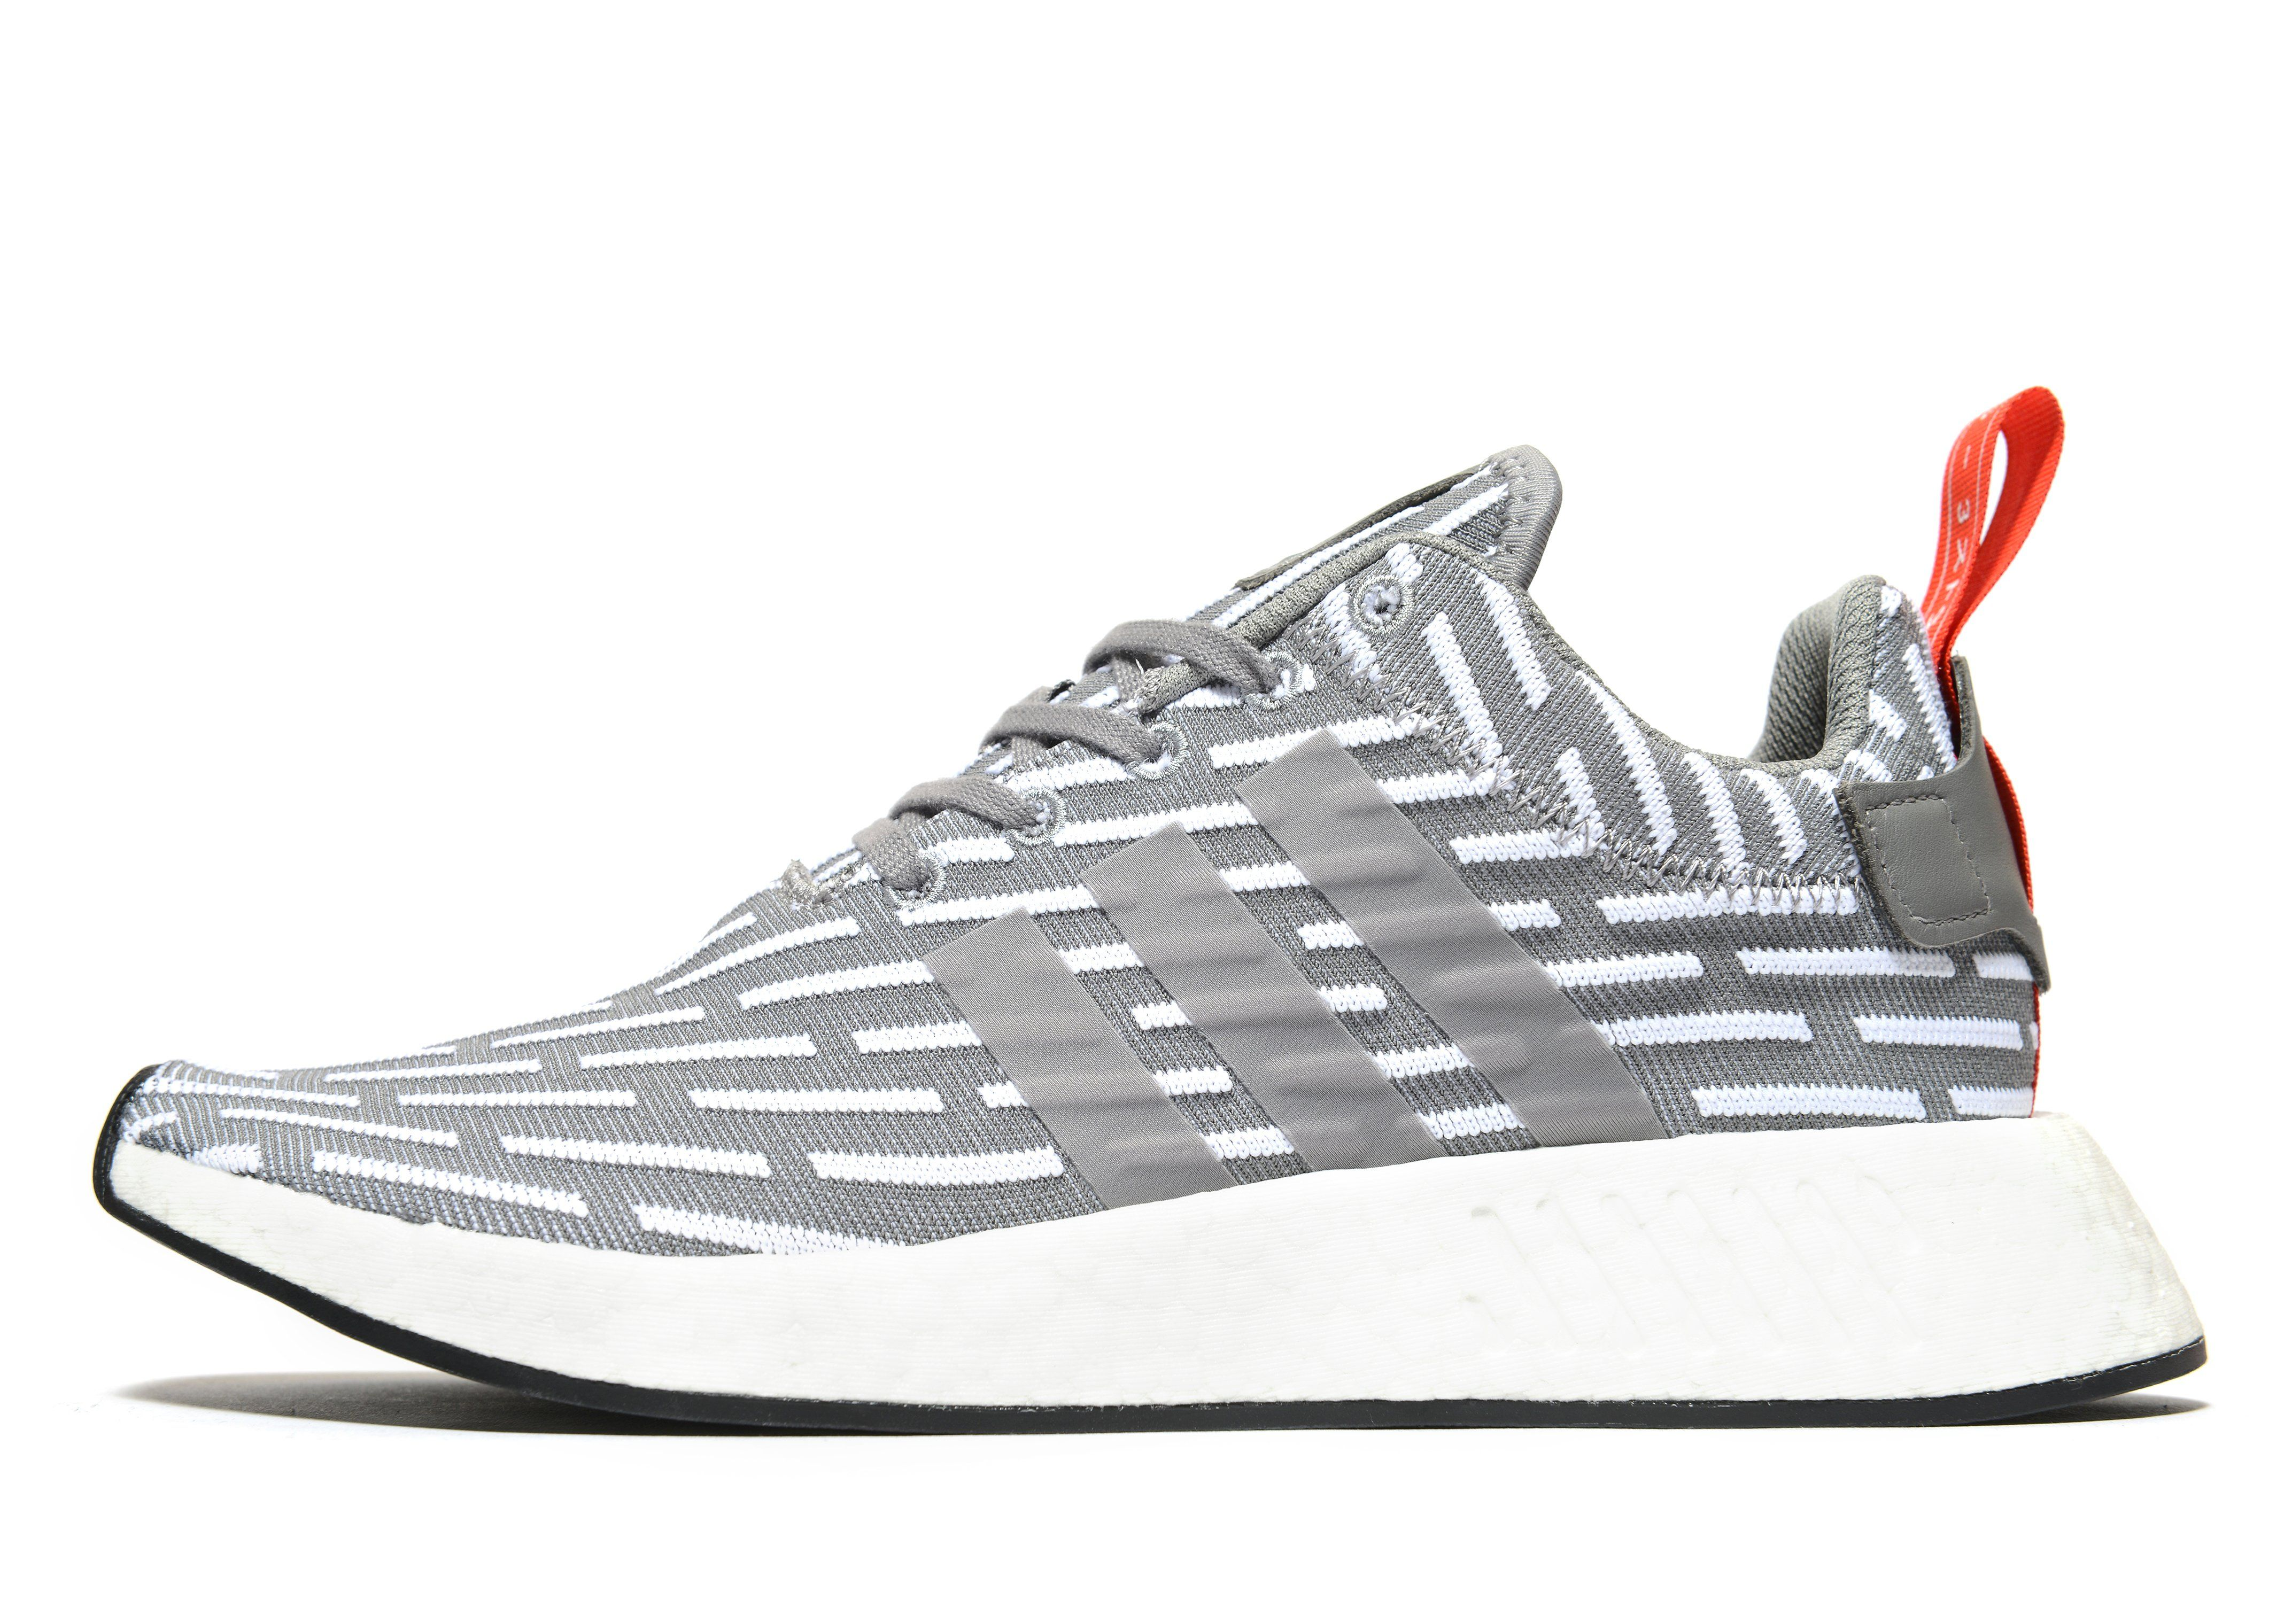 The adidas Originals NMD R2 Europe Exclusive